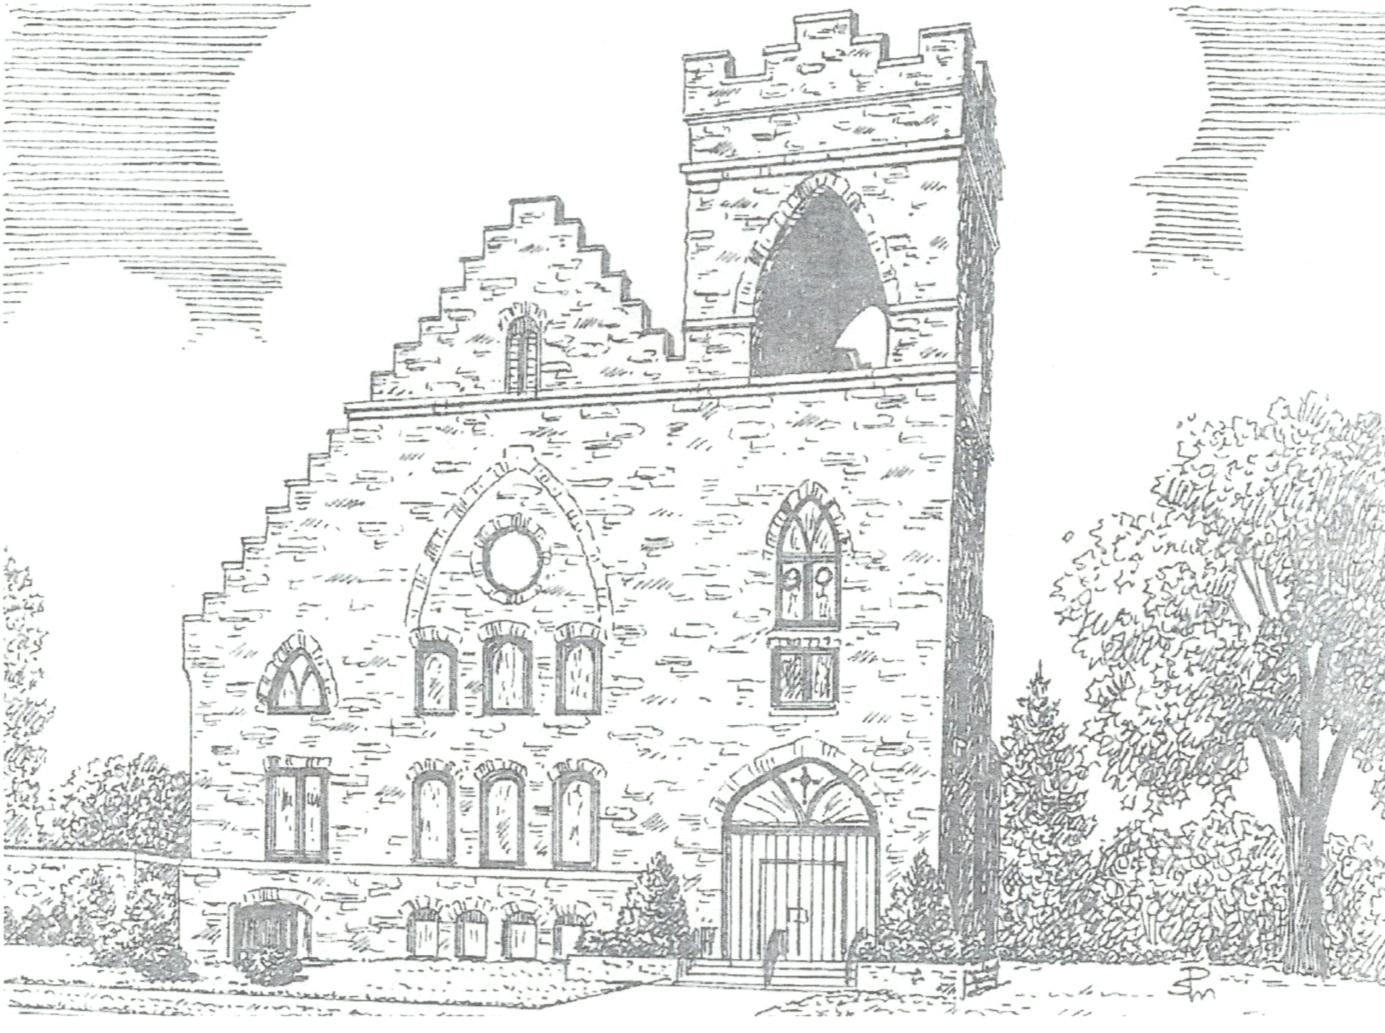 upc_current_church_sketch